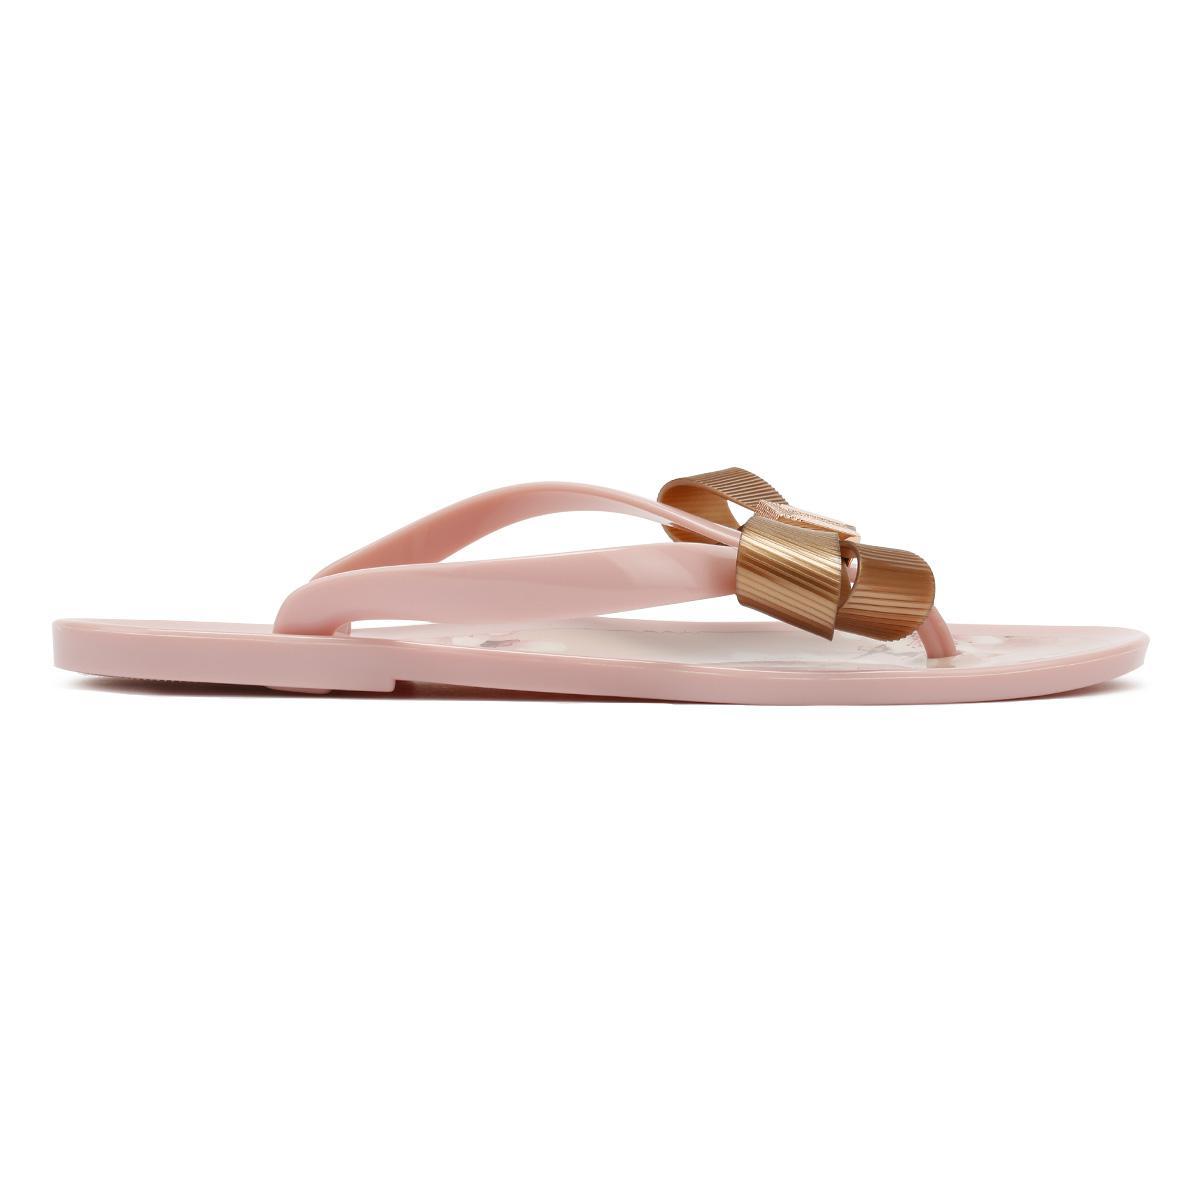 06299380ef2c58 Ted Baker Womens Blossom Pink Susziep Flip Flops in Pink - Lyst